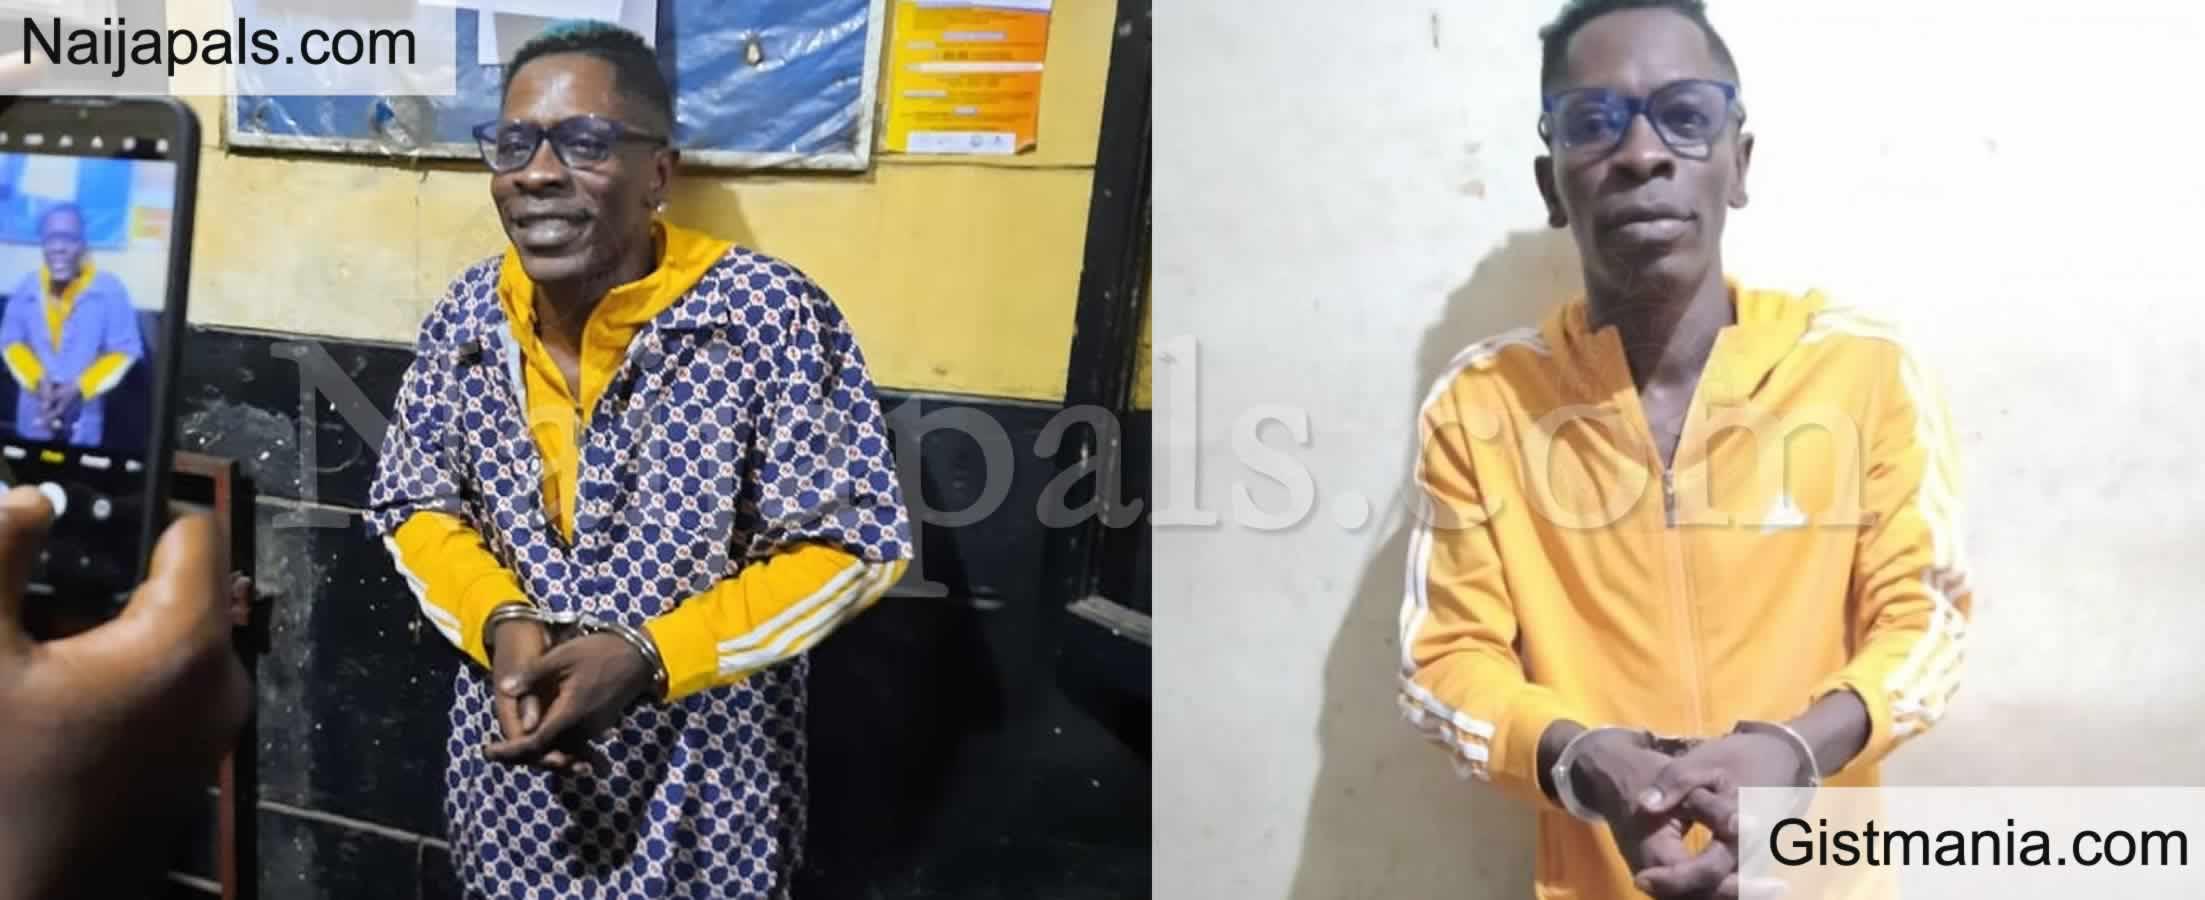 <img alt='.' class='lazyload' data-src='https://img.gistmania.com/emot/video.gif' /> VIDEO:<b> Police Arrest Ghanaian Singer, Shatta Wale For Faking His Shooting</b>